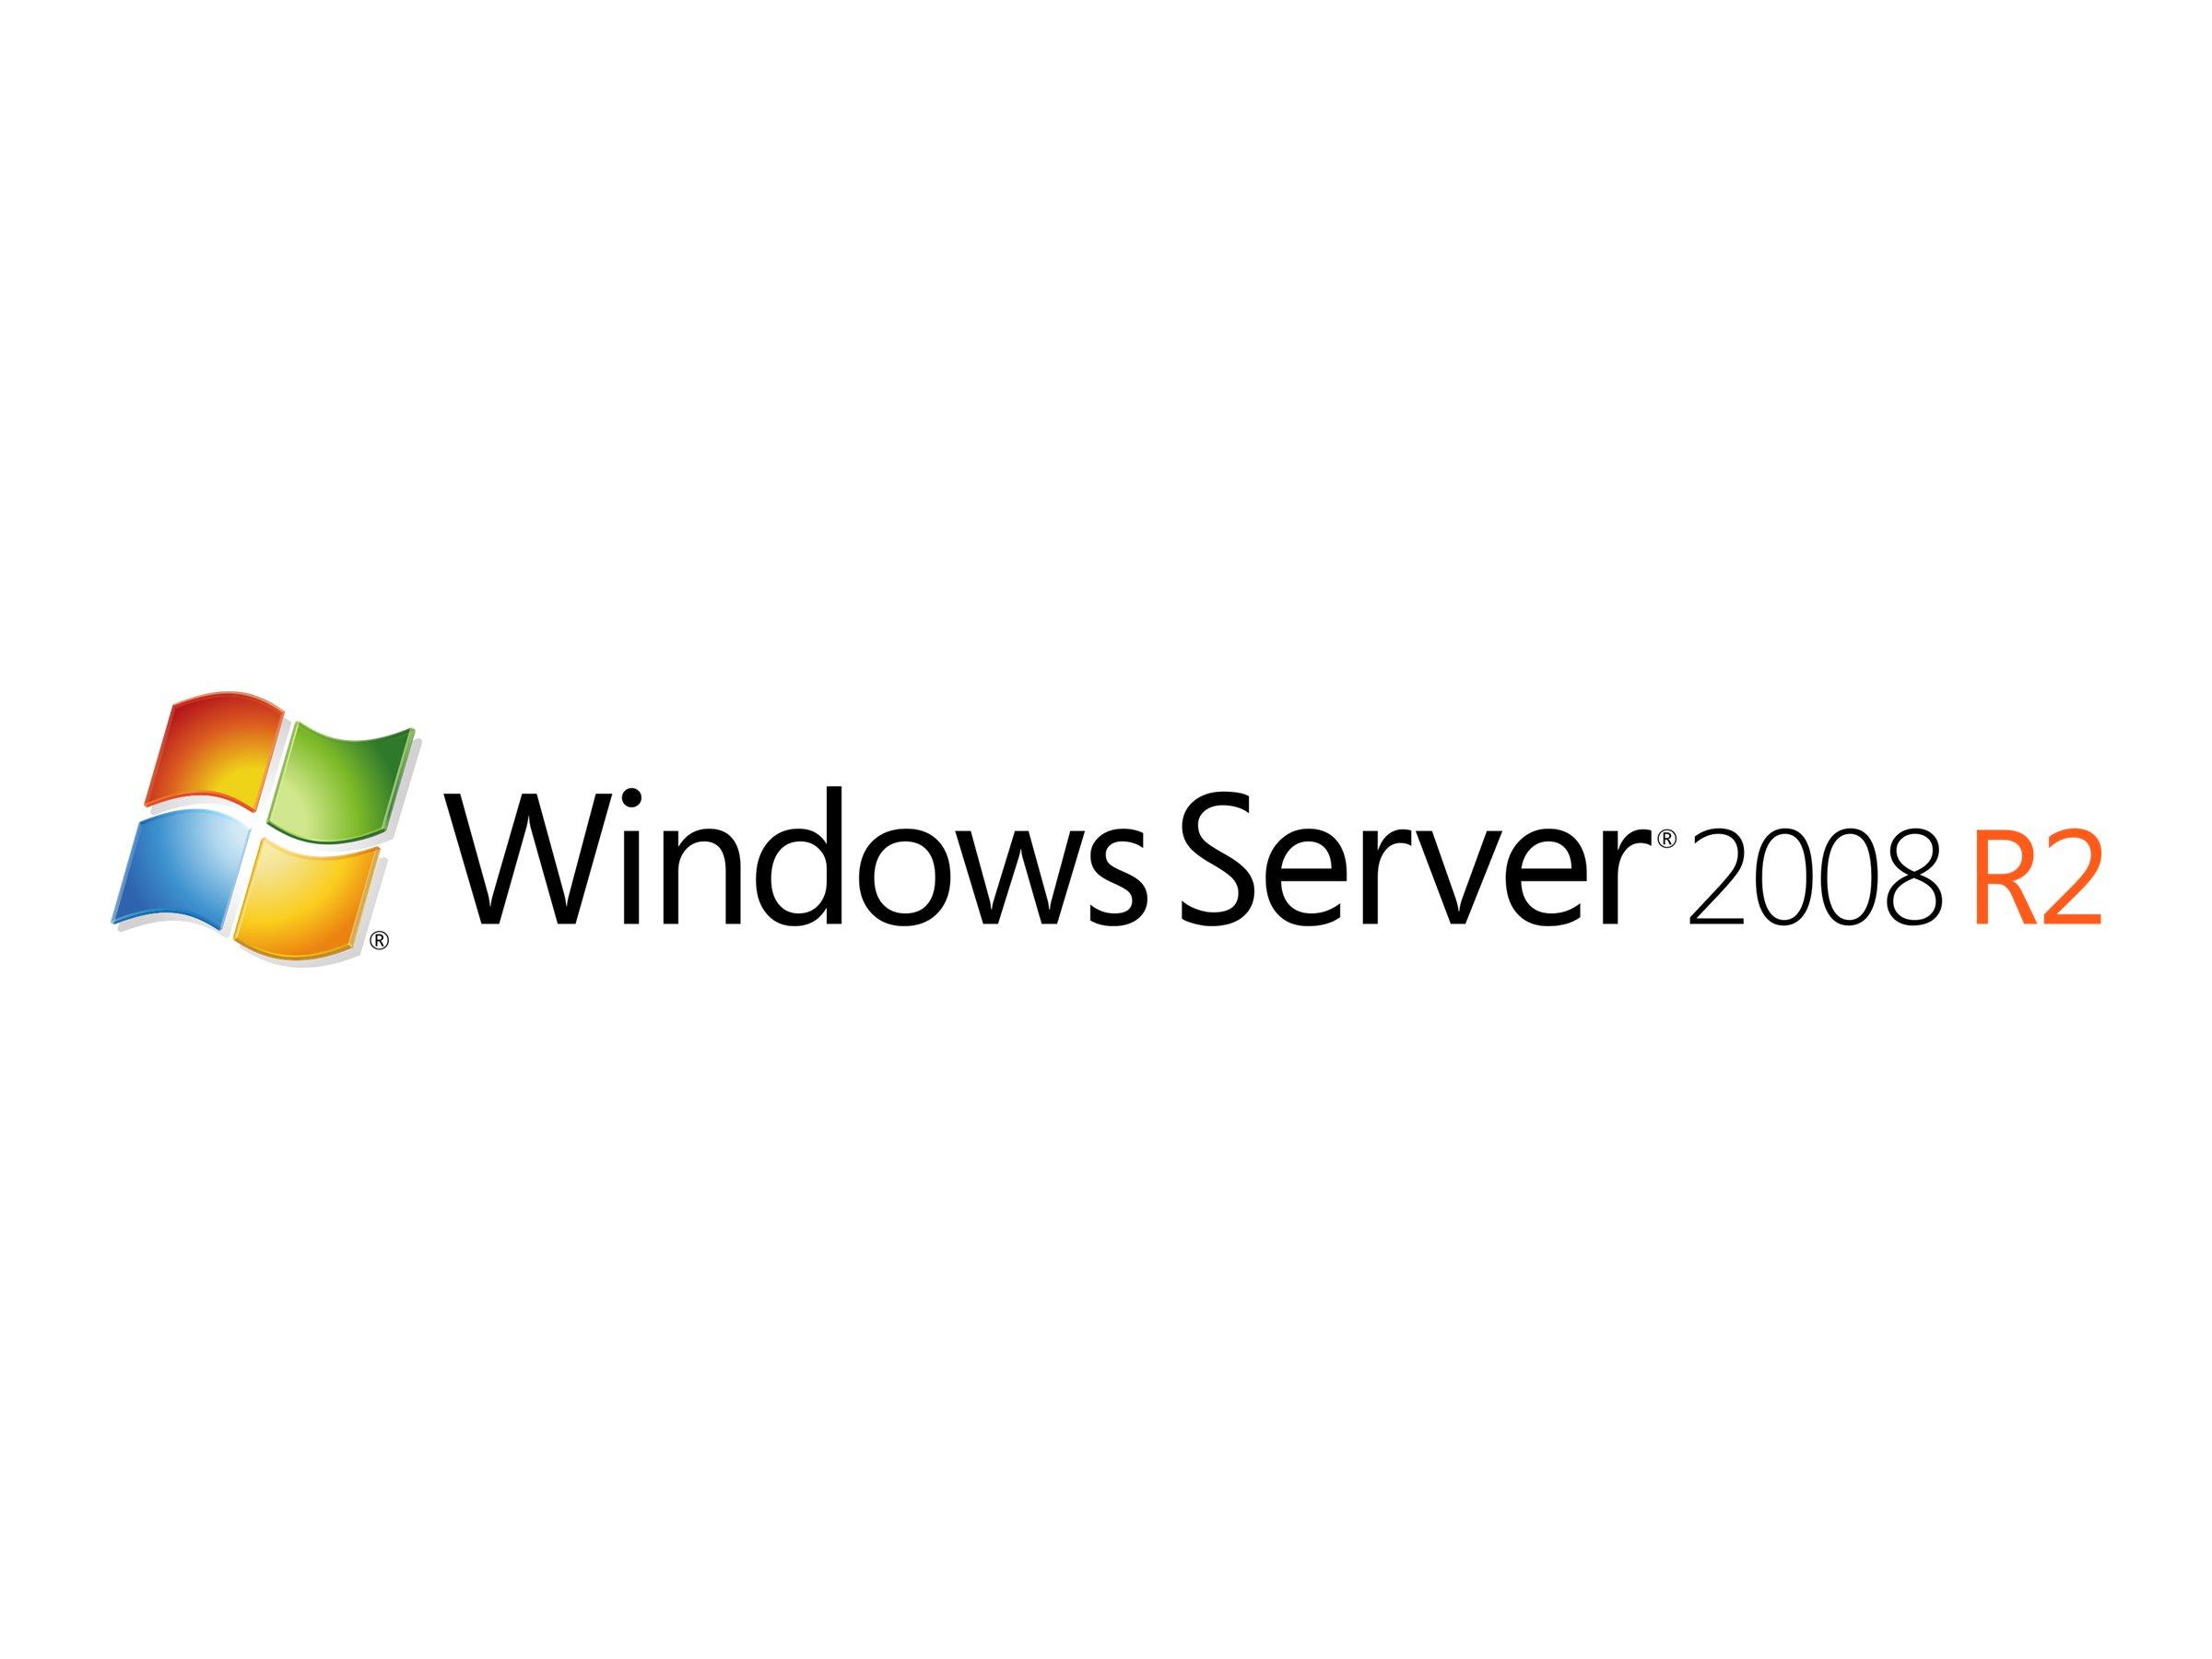 MICROSOFT WINDOWS SERVER2012 R2 STANDARD DOWNGRAD